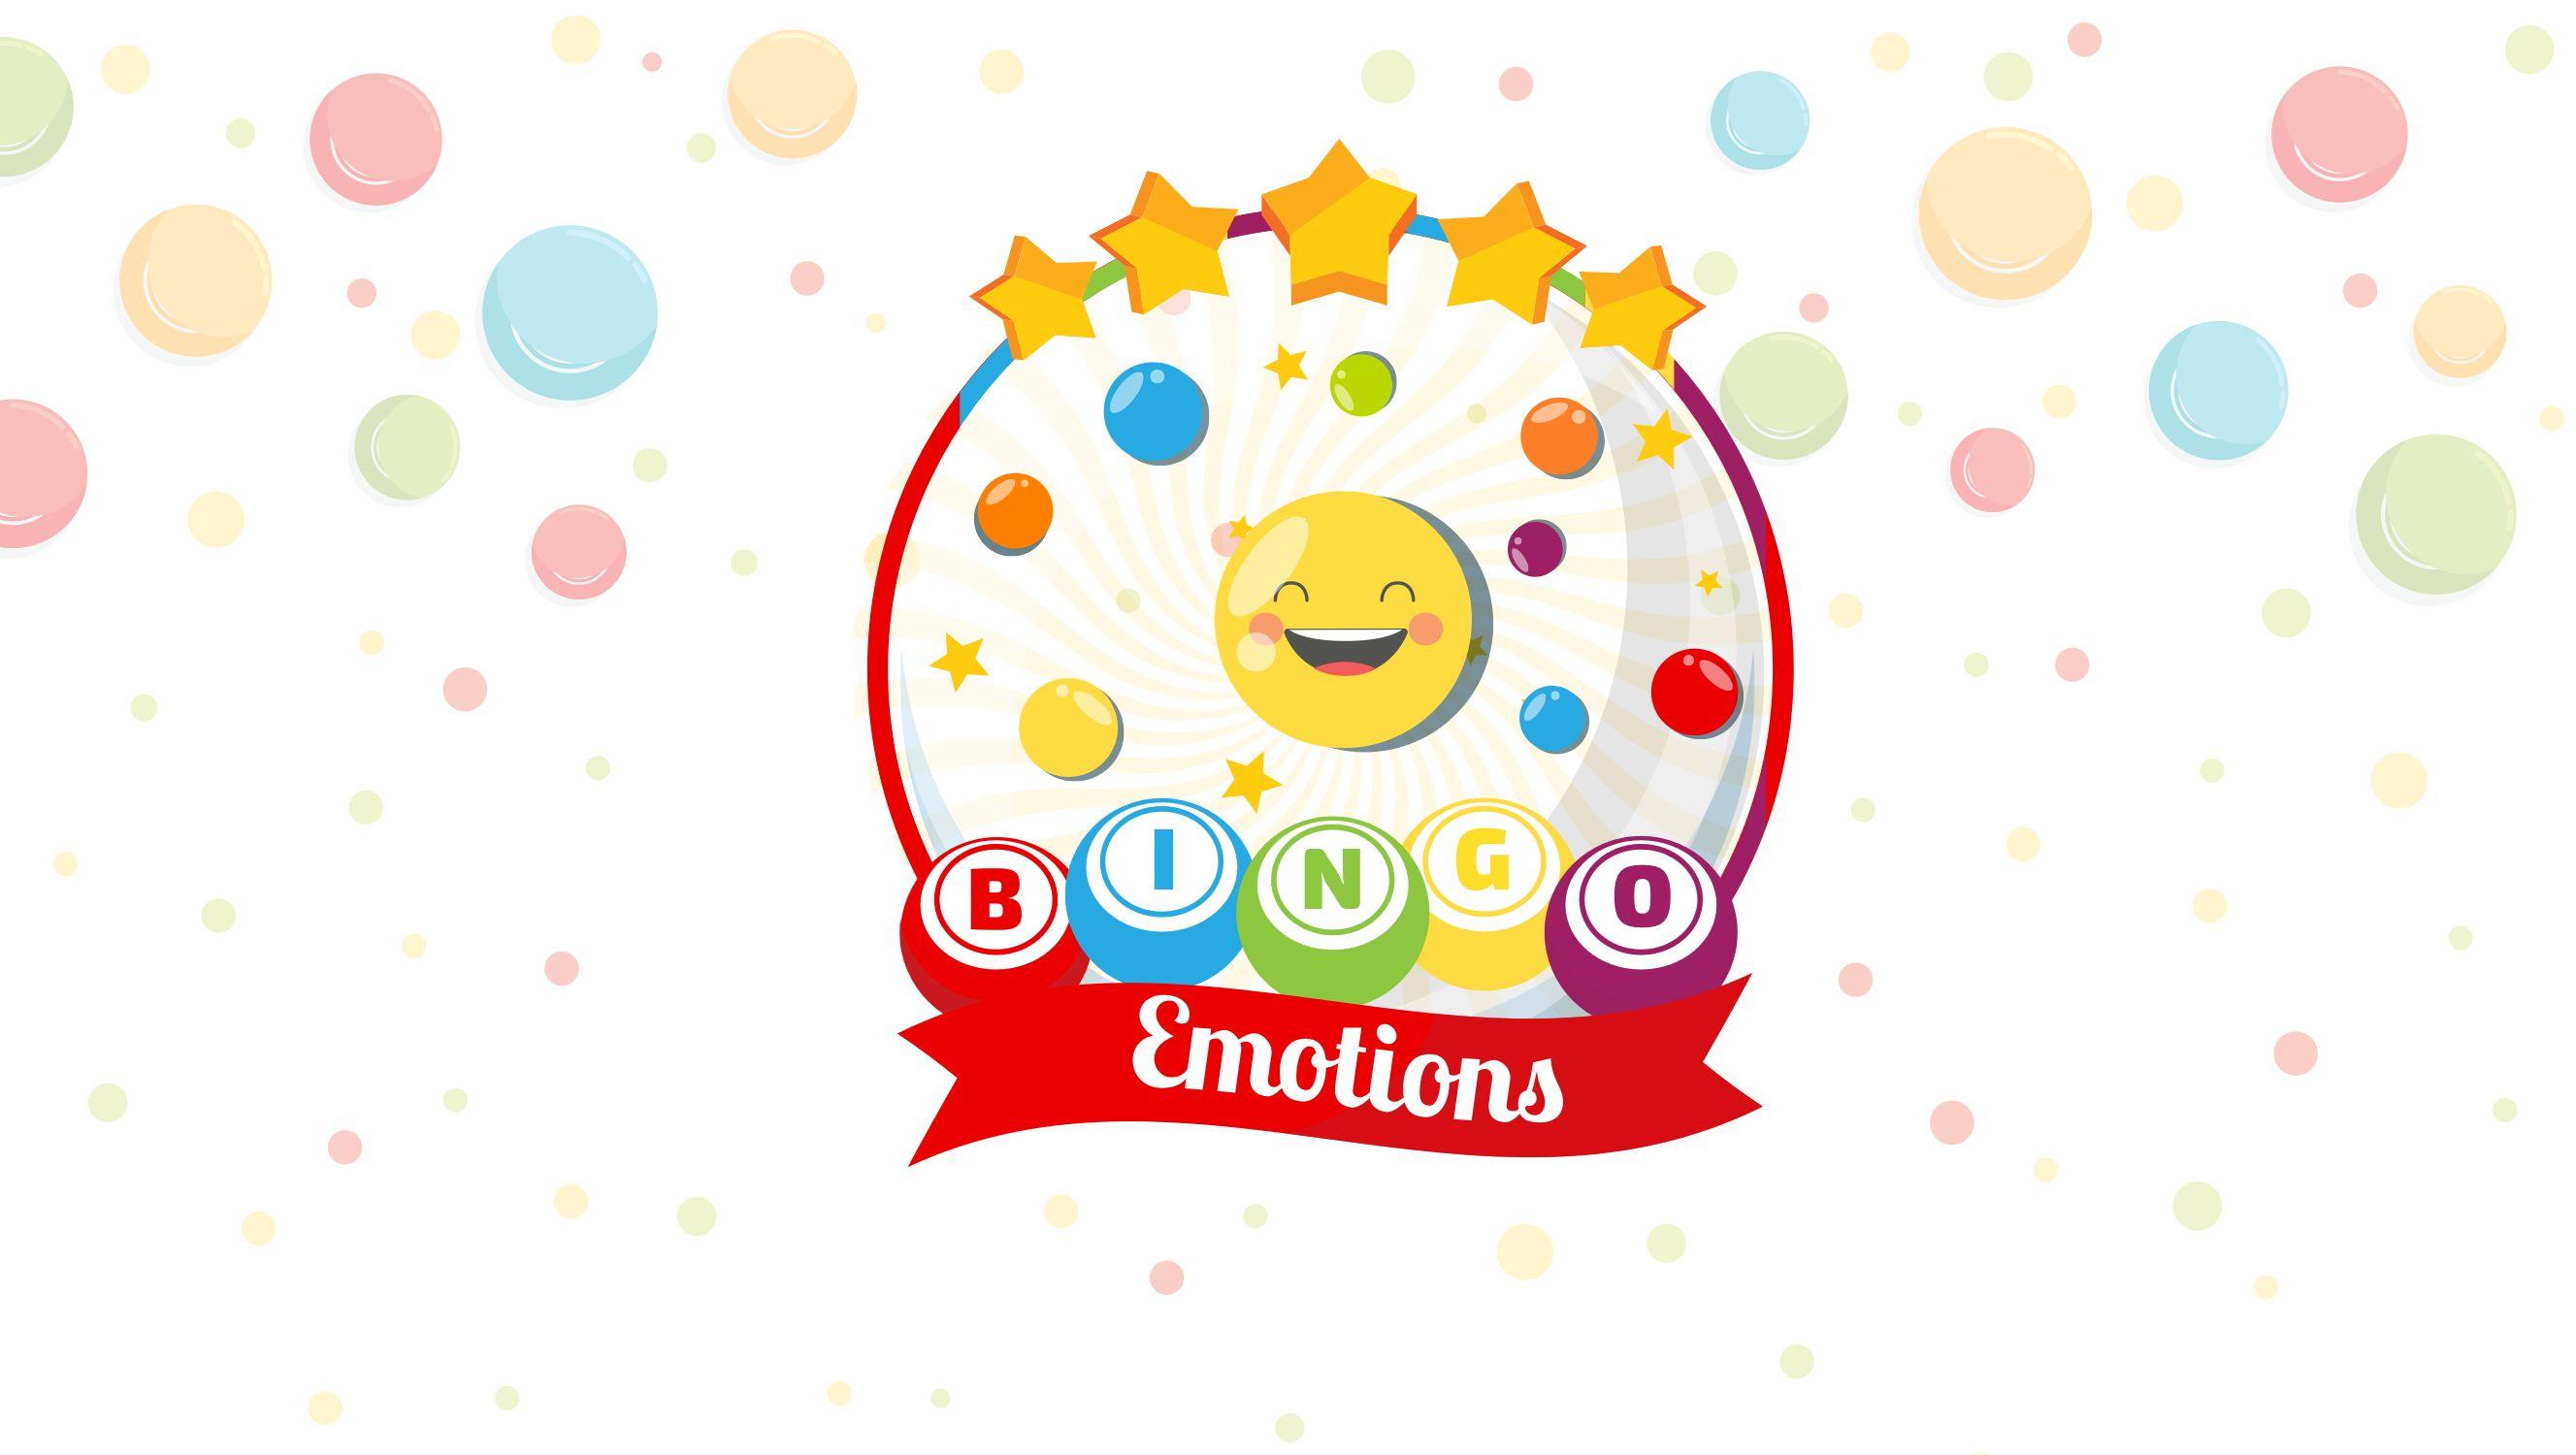 Bingo: Emotions